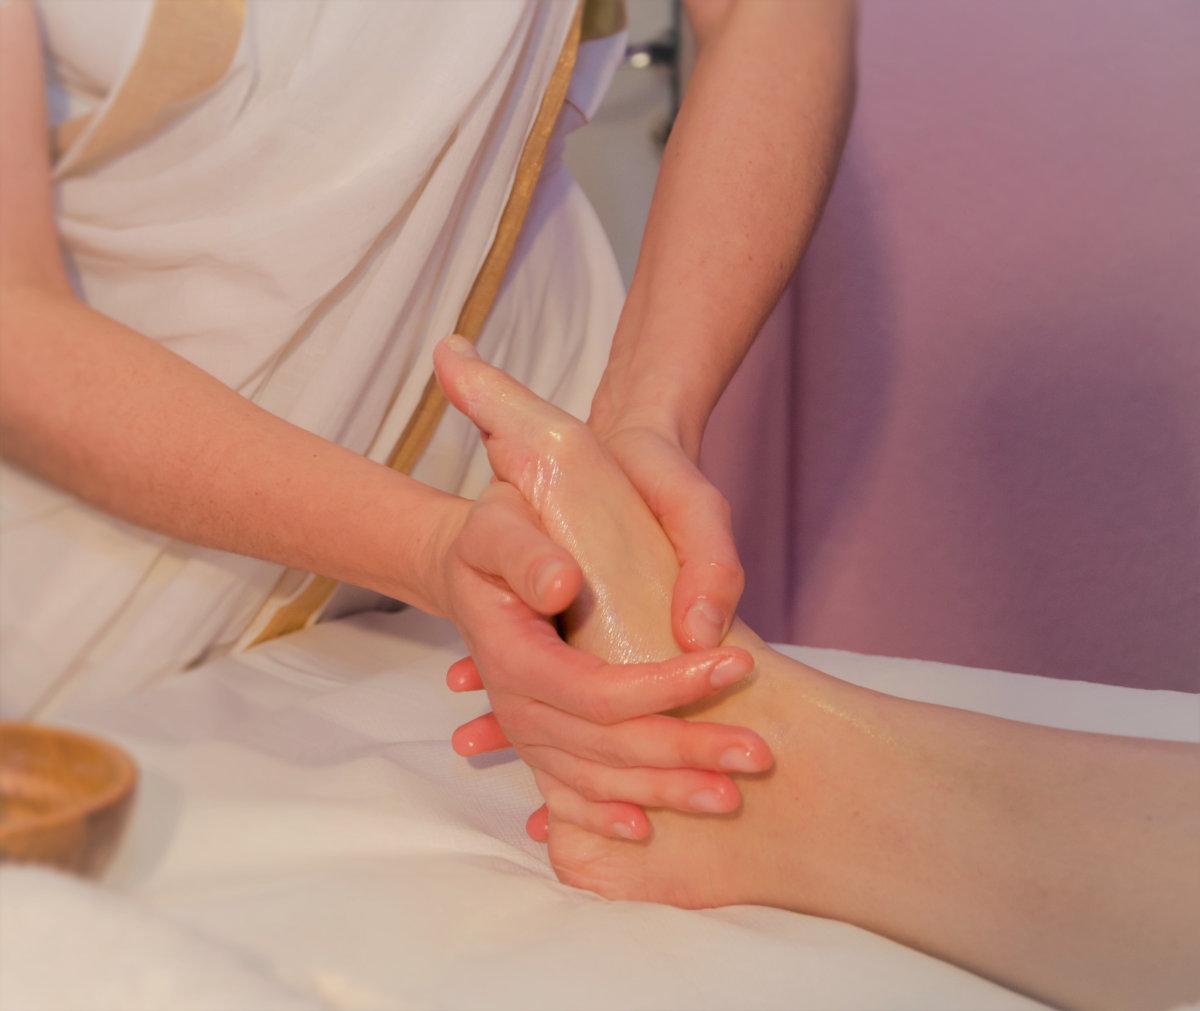 Padabhyangam massaggio ai piedi